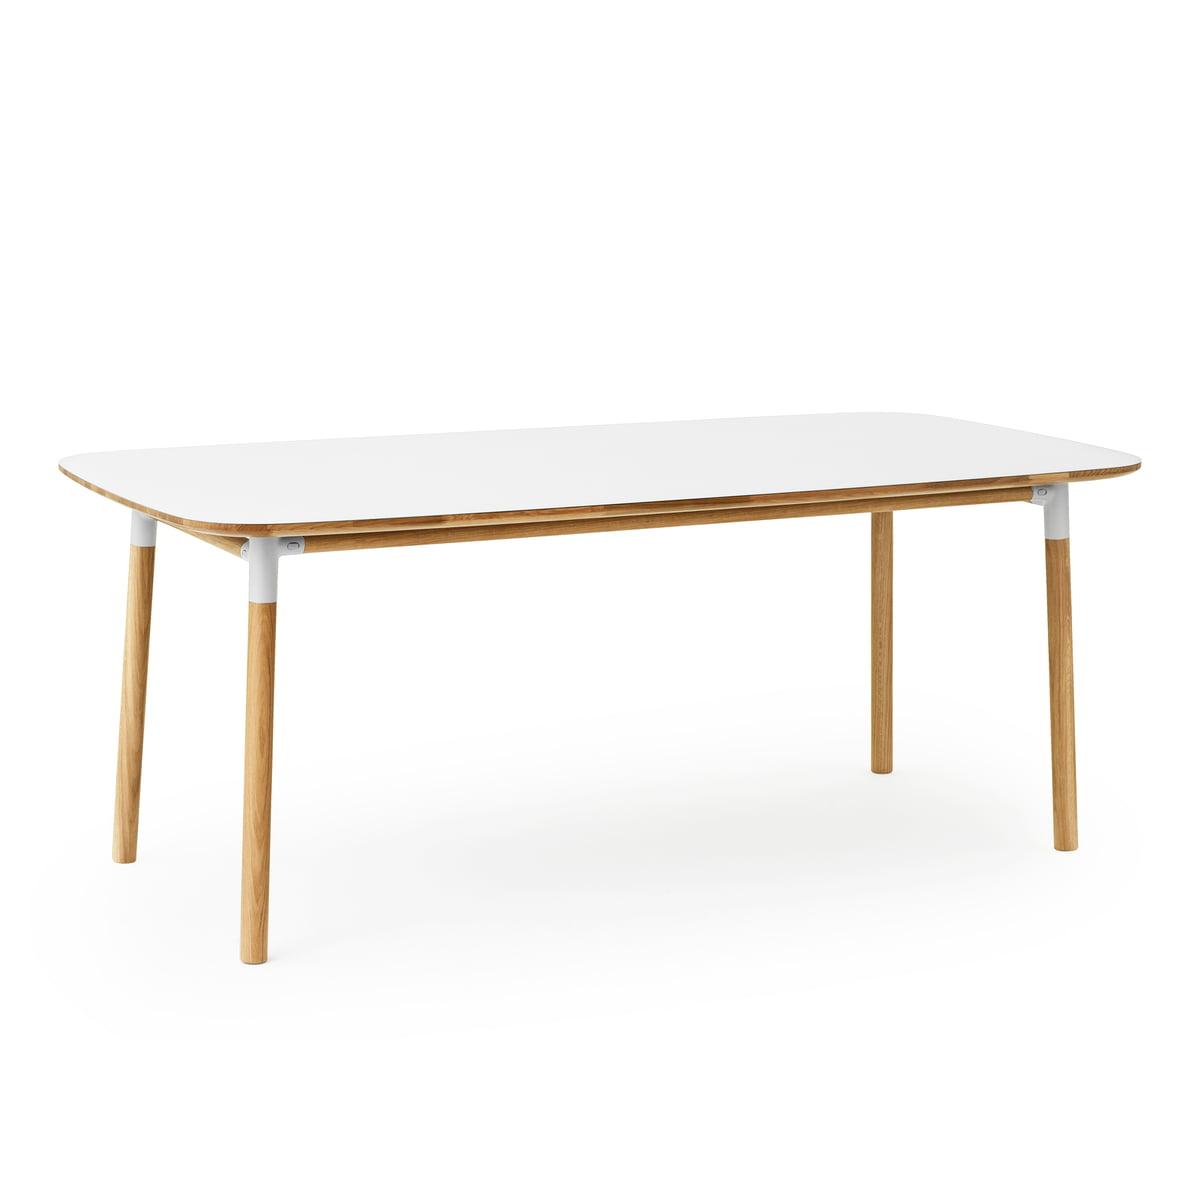 Normann copenhagen form table 95 x 200 cm eiche weiss